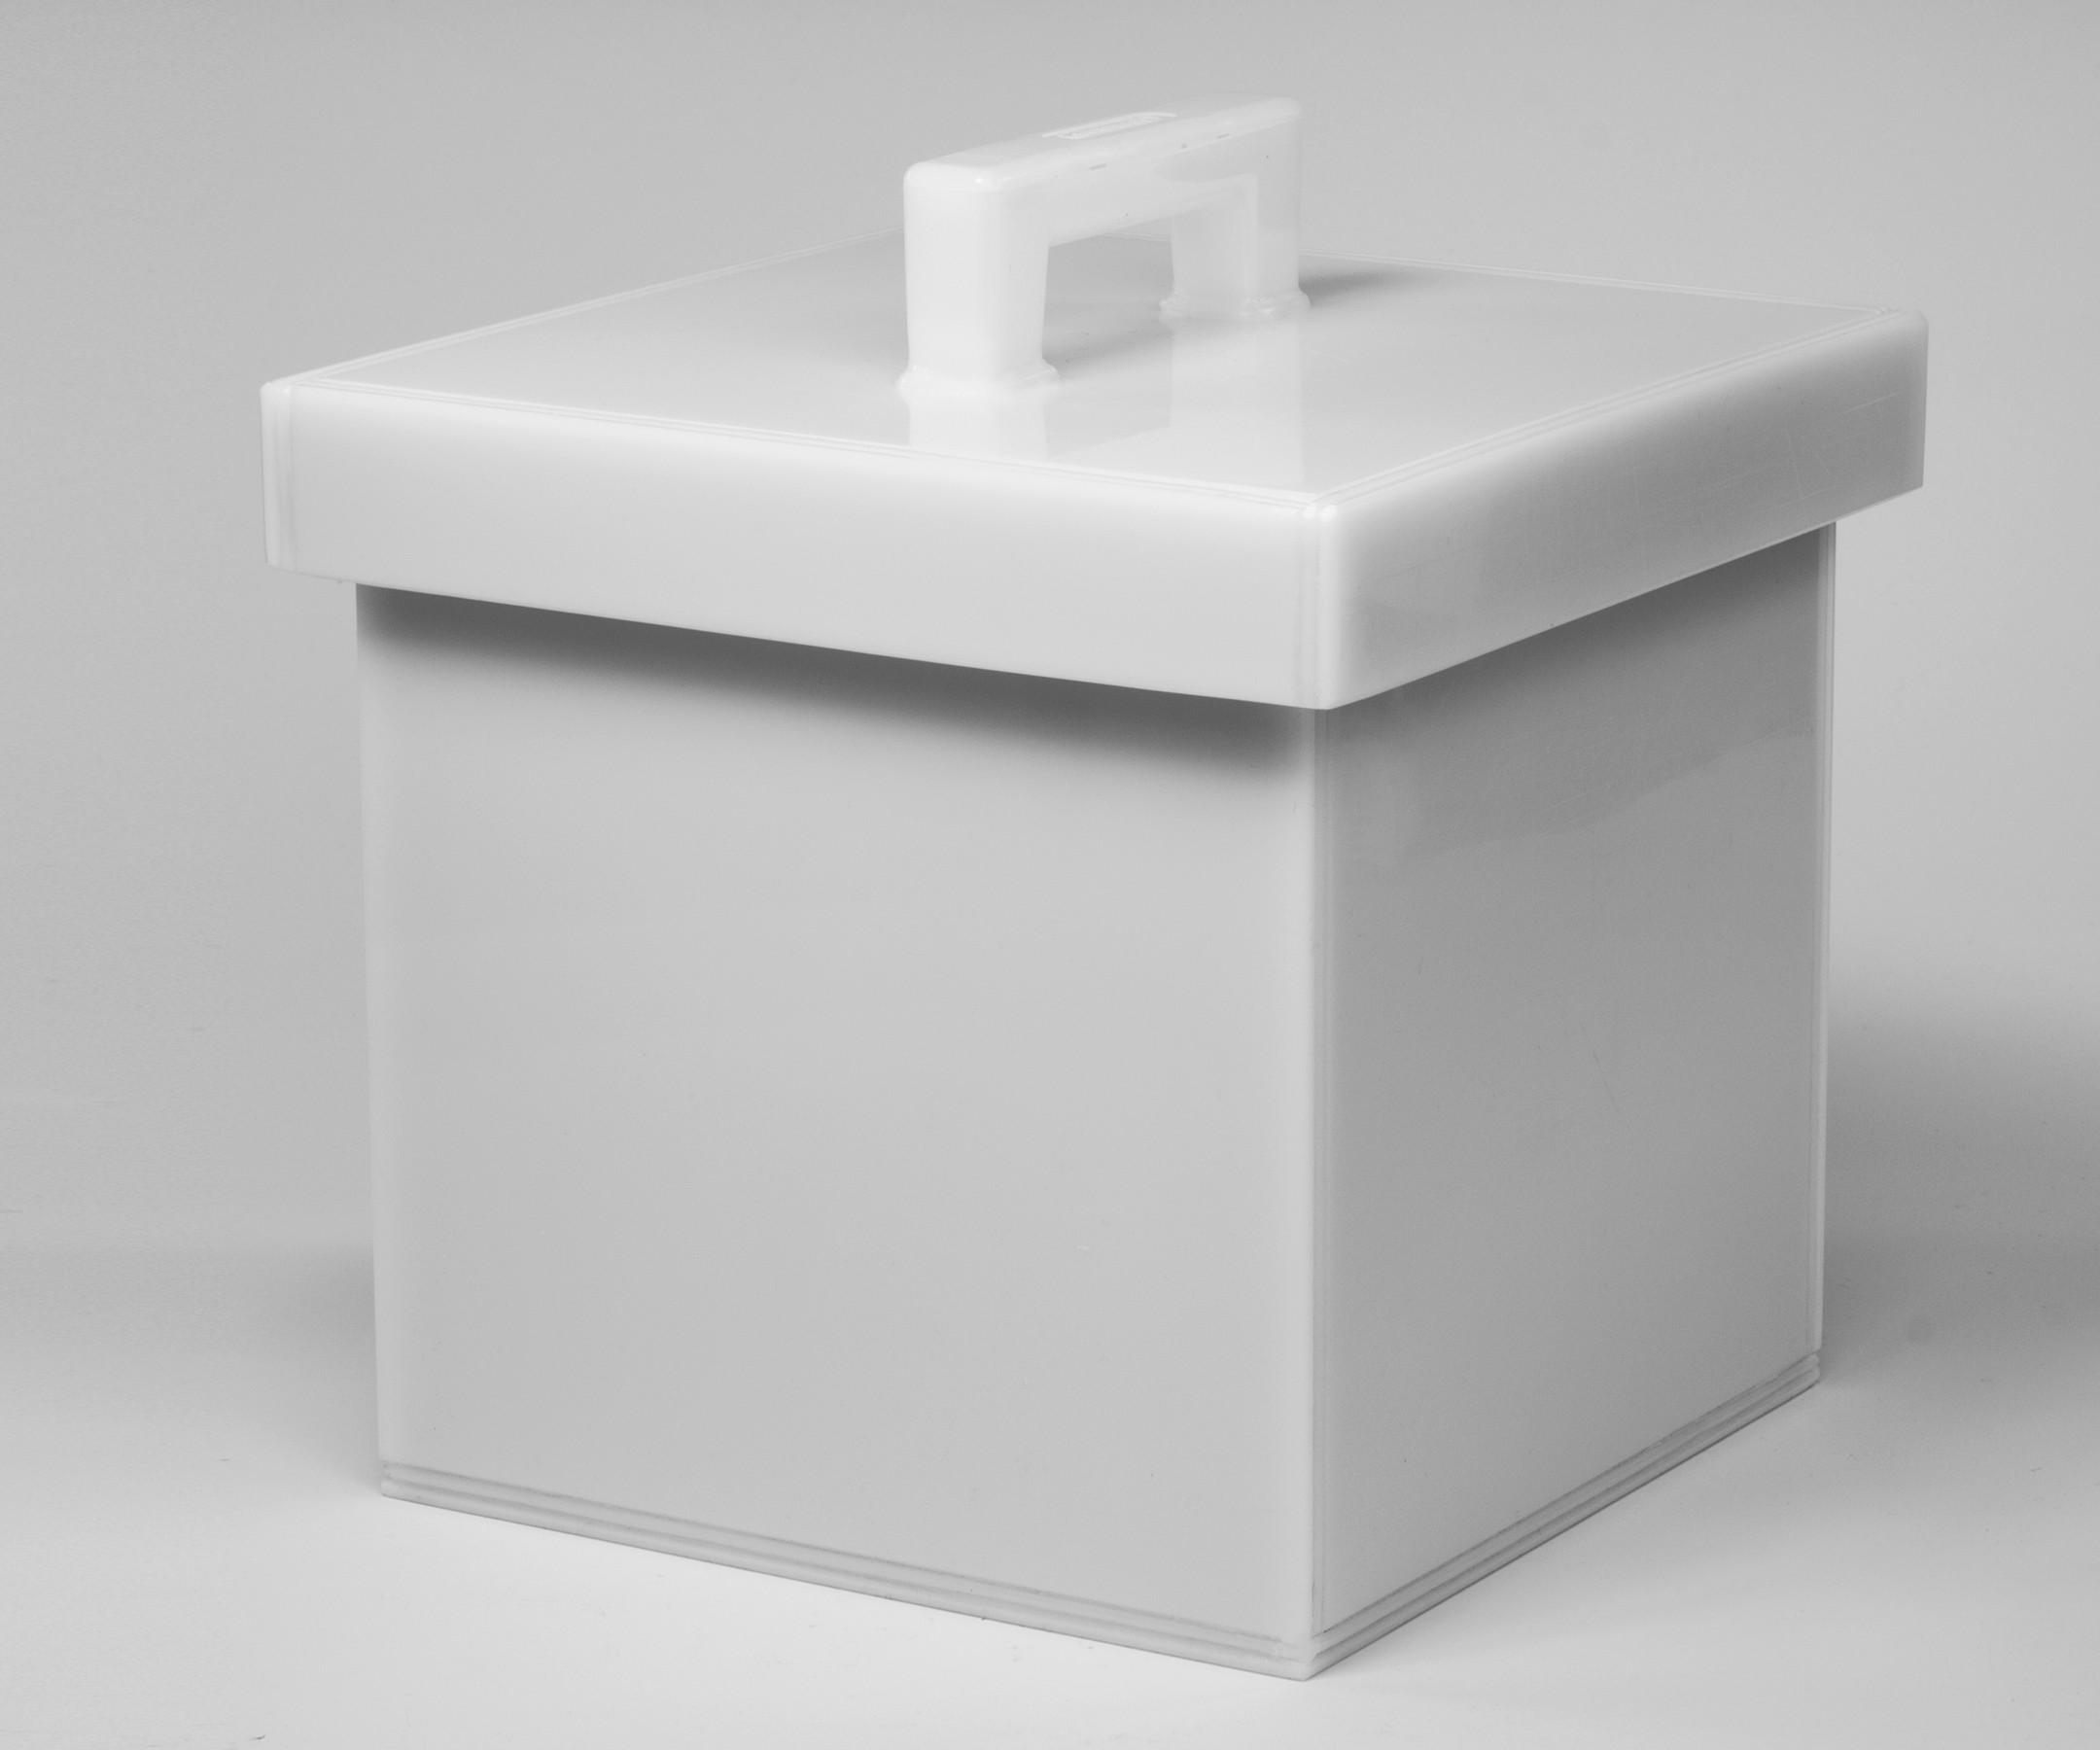 Bel Art Lead Lined Polyethylene Storage Box 25L x 25W x 25cmH